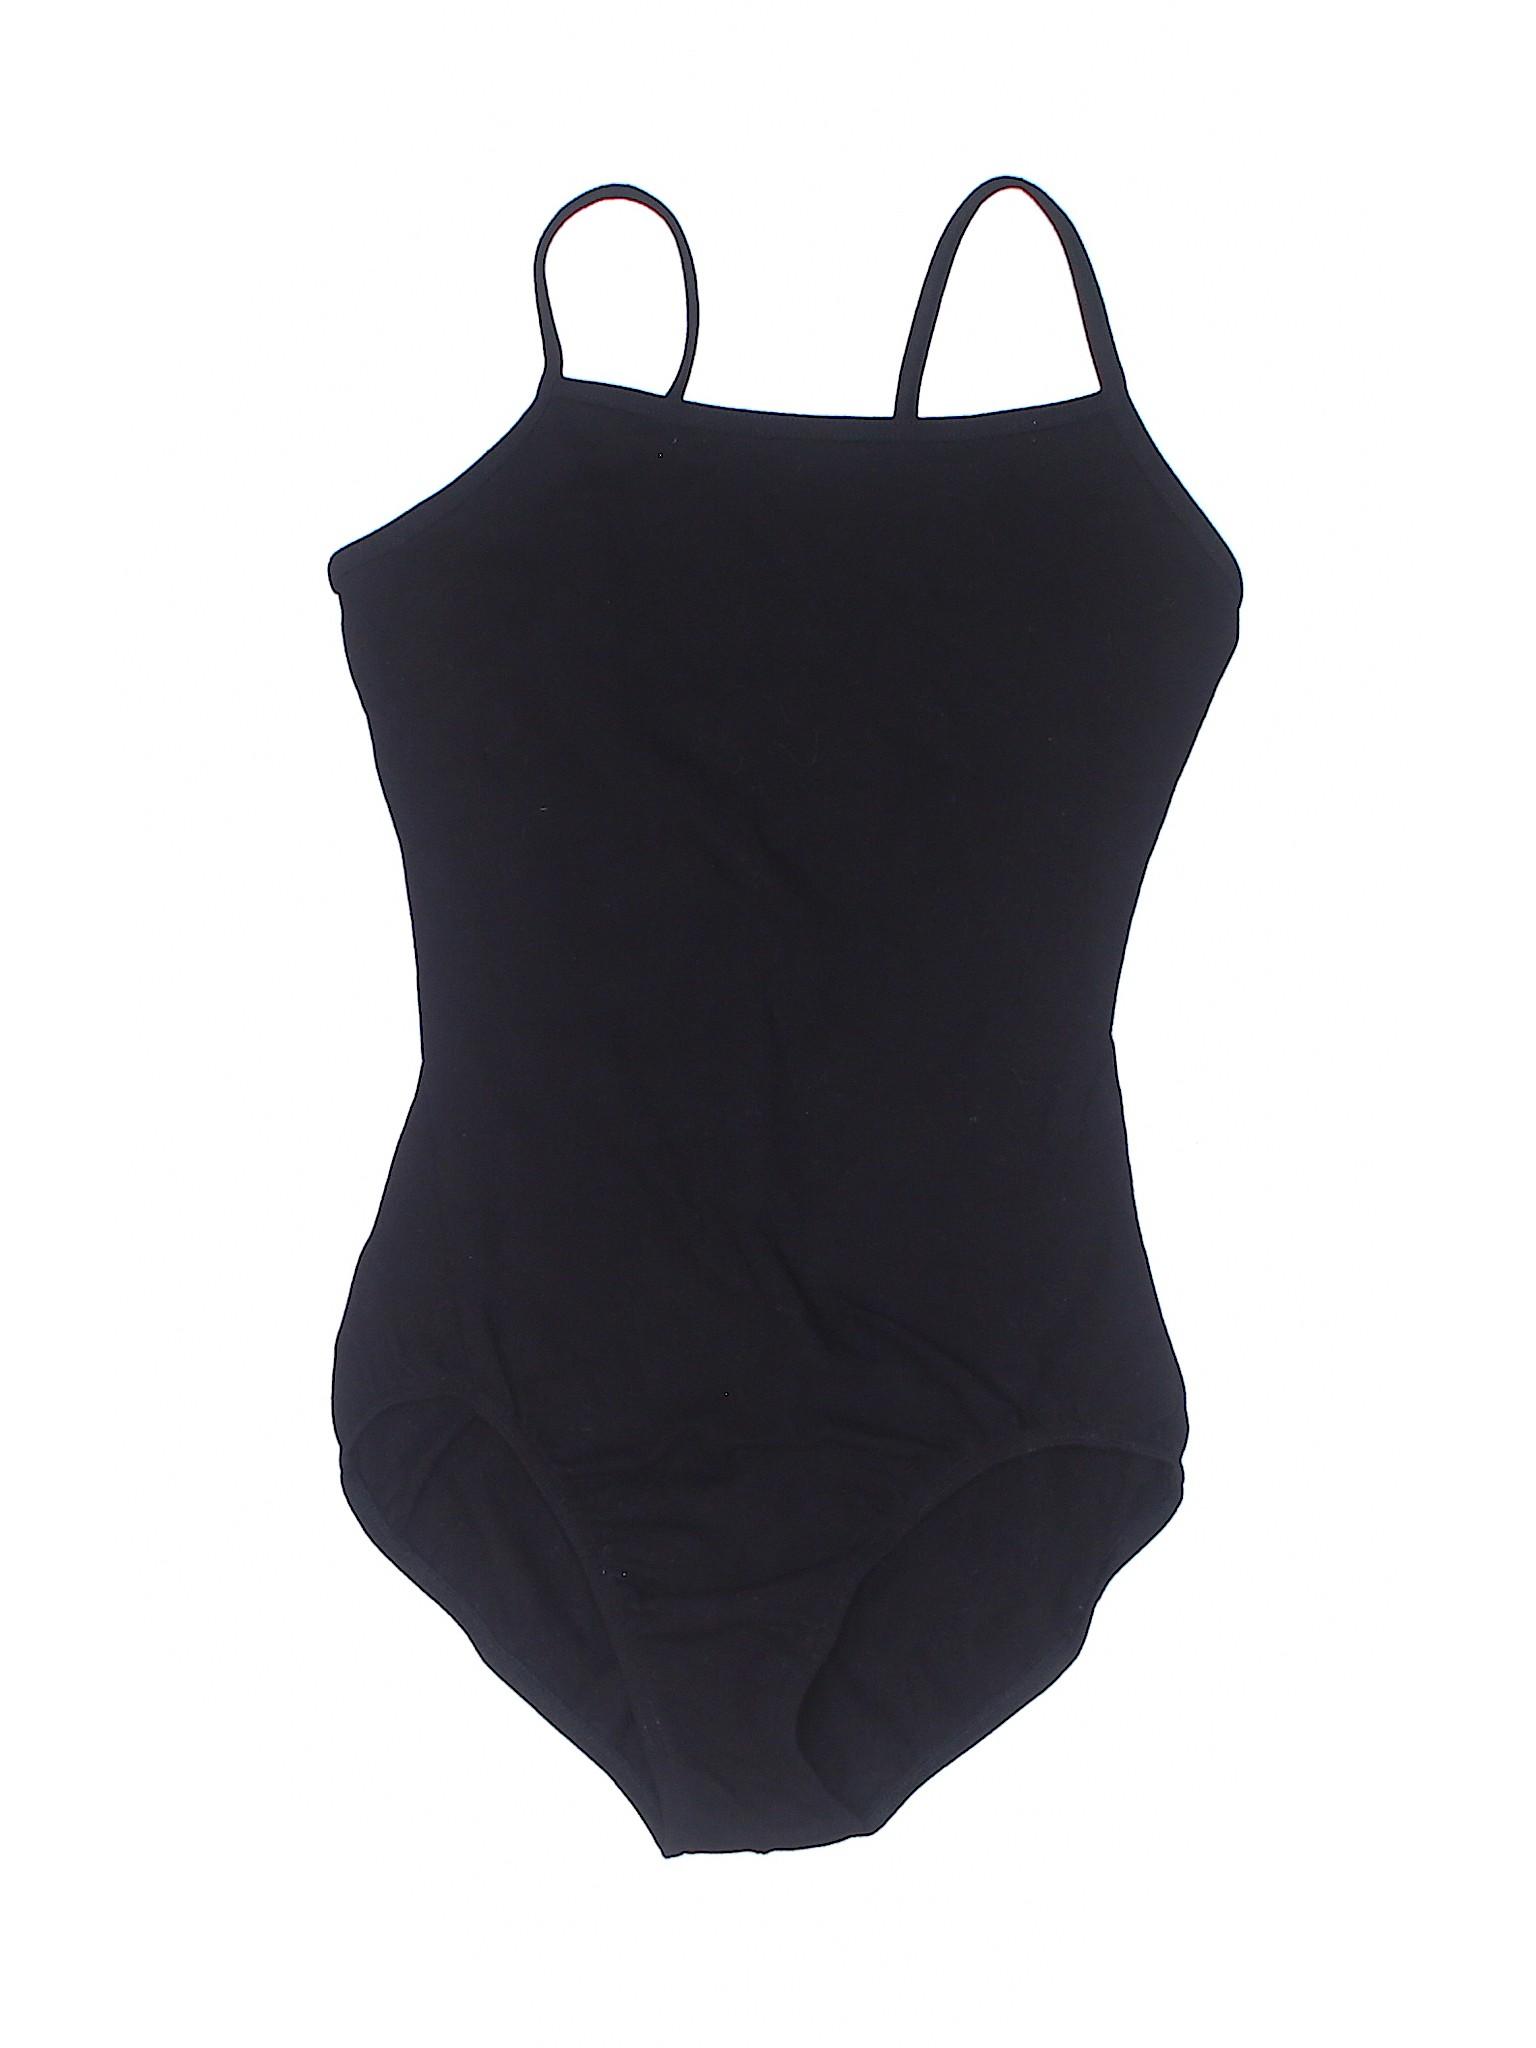 Swimsuit Piece One Swimsuit One Boutique Mirella Piece Mirella Boutique qqOSF